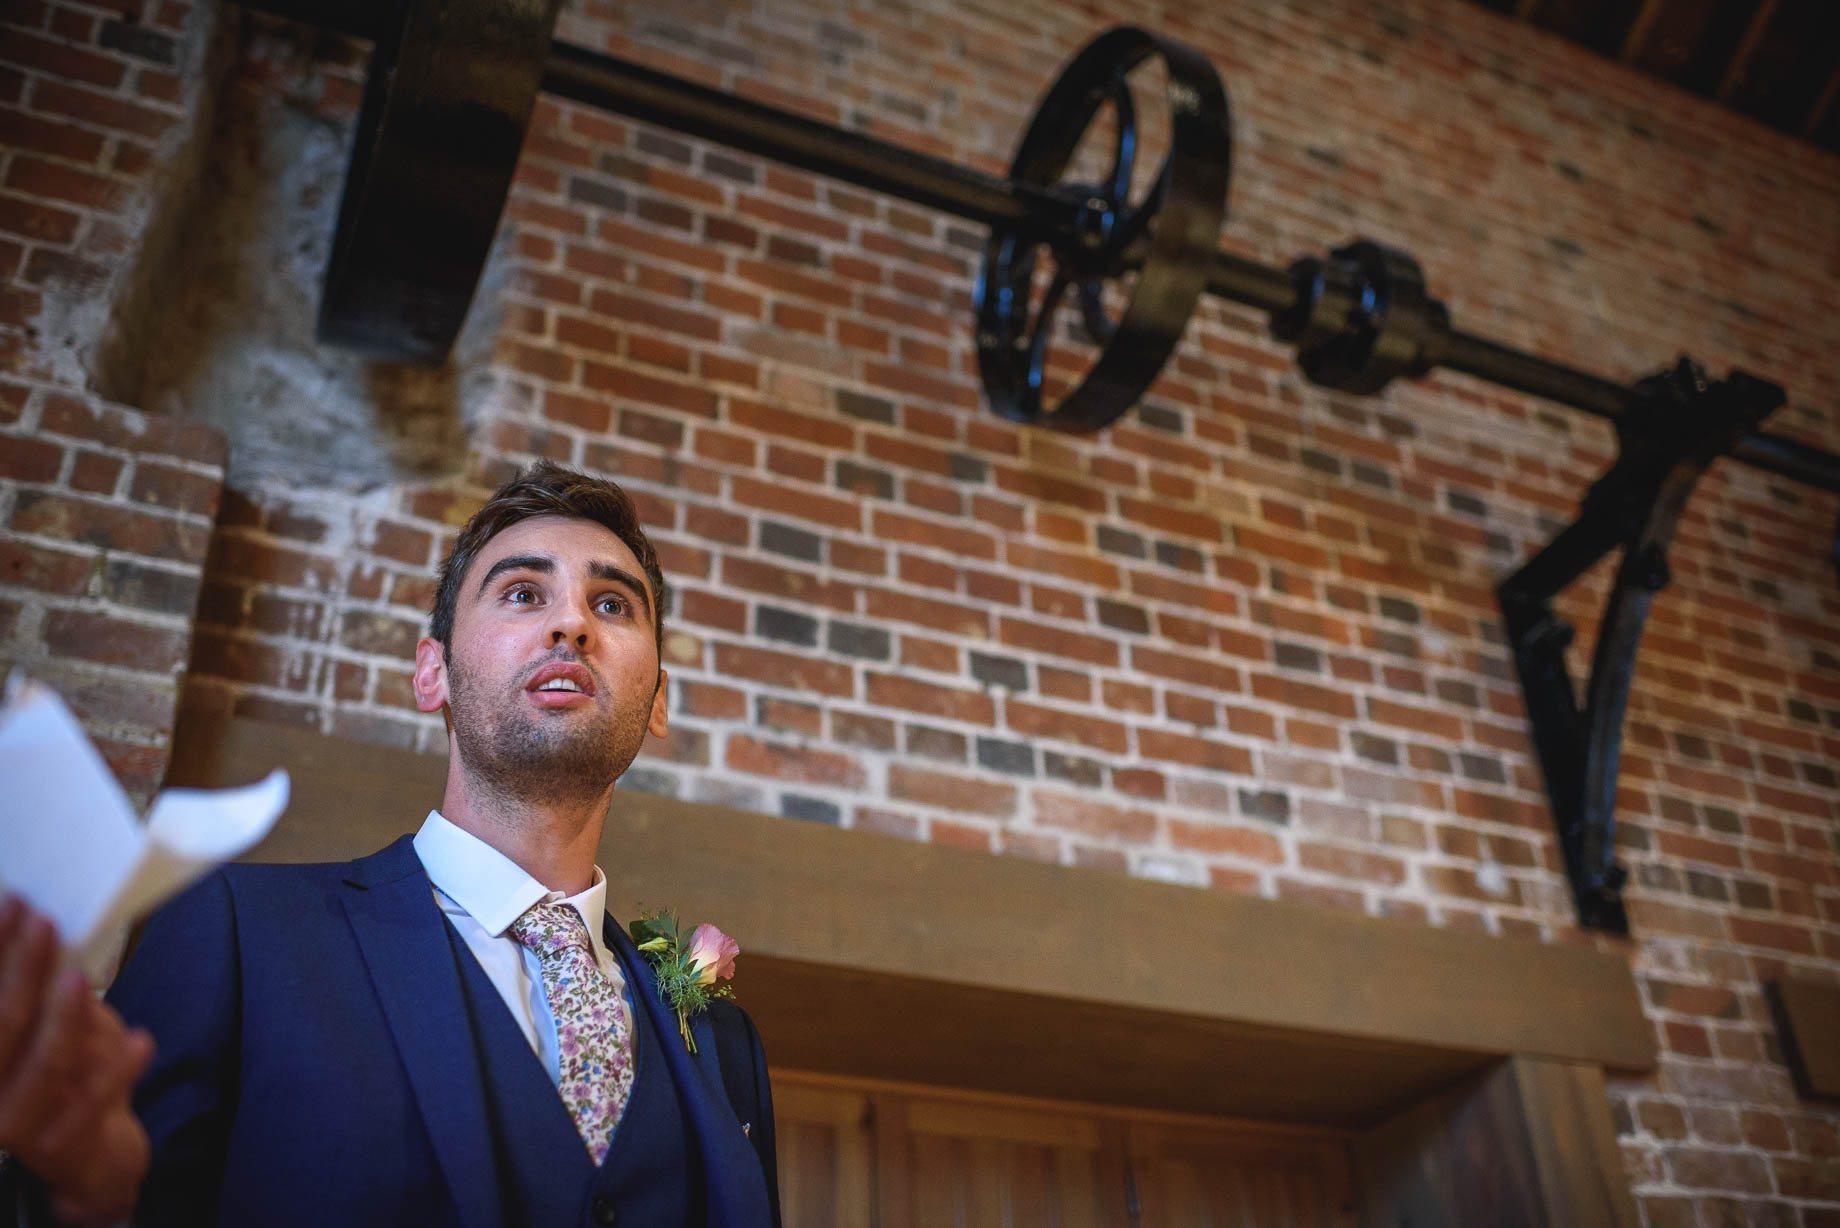 Gaynes Park wedding photography - Guy Collier Photography - Rachel and Jon (132 of 169)